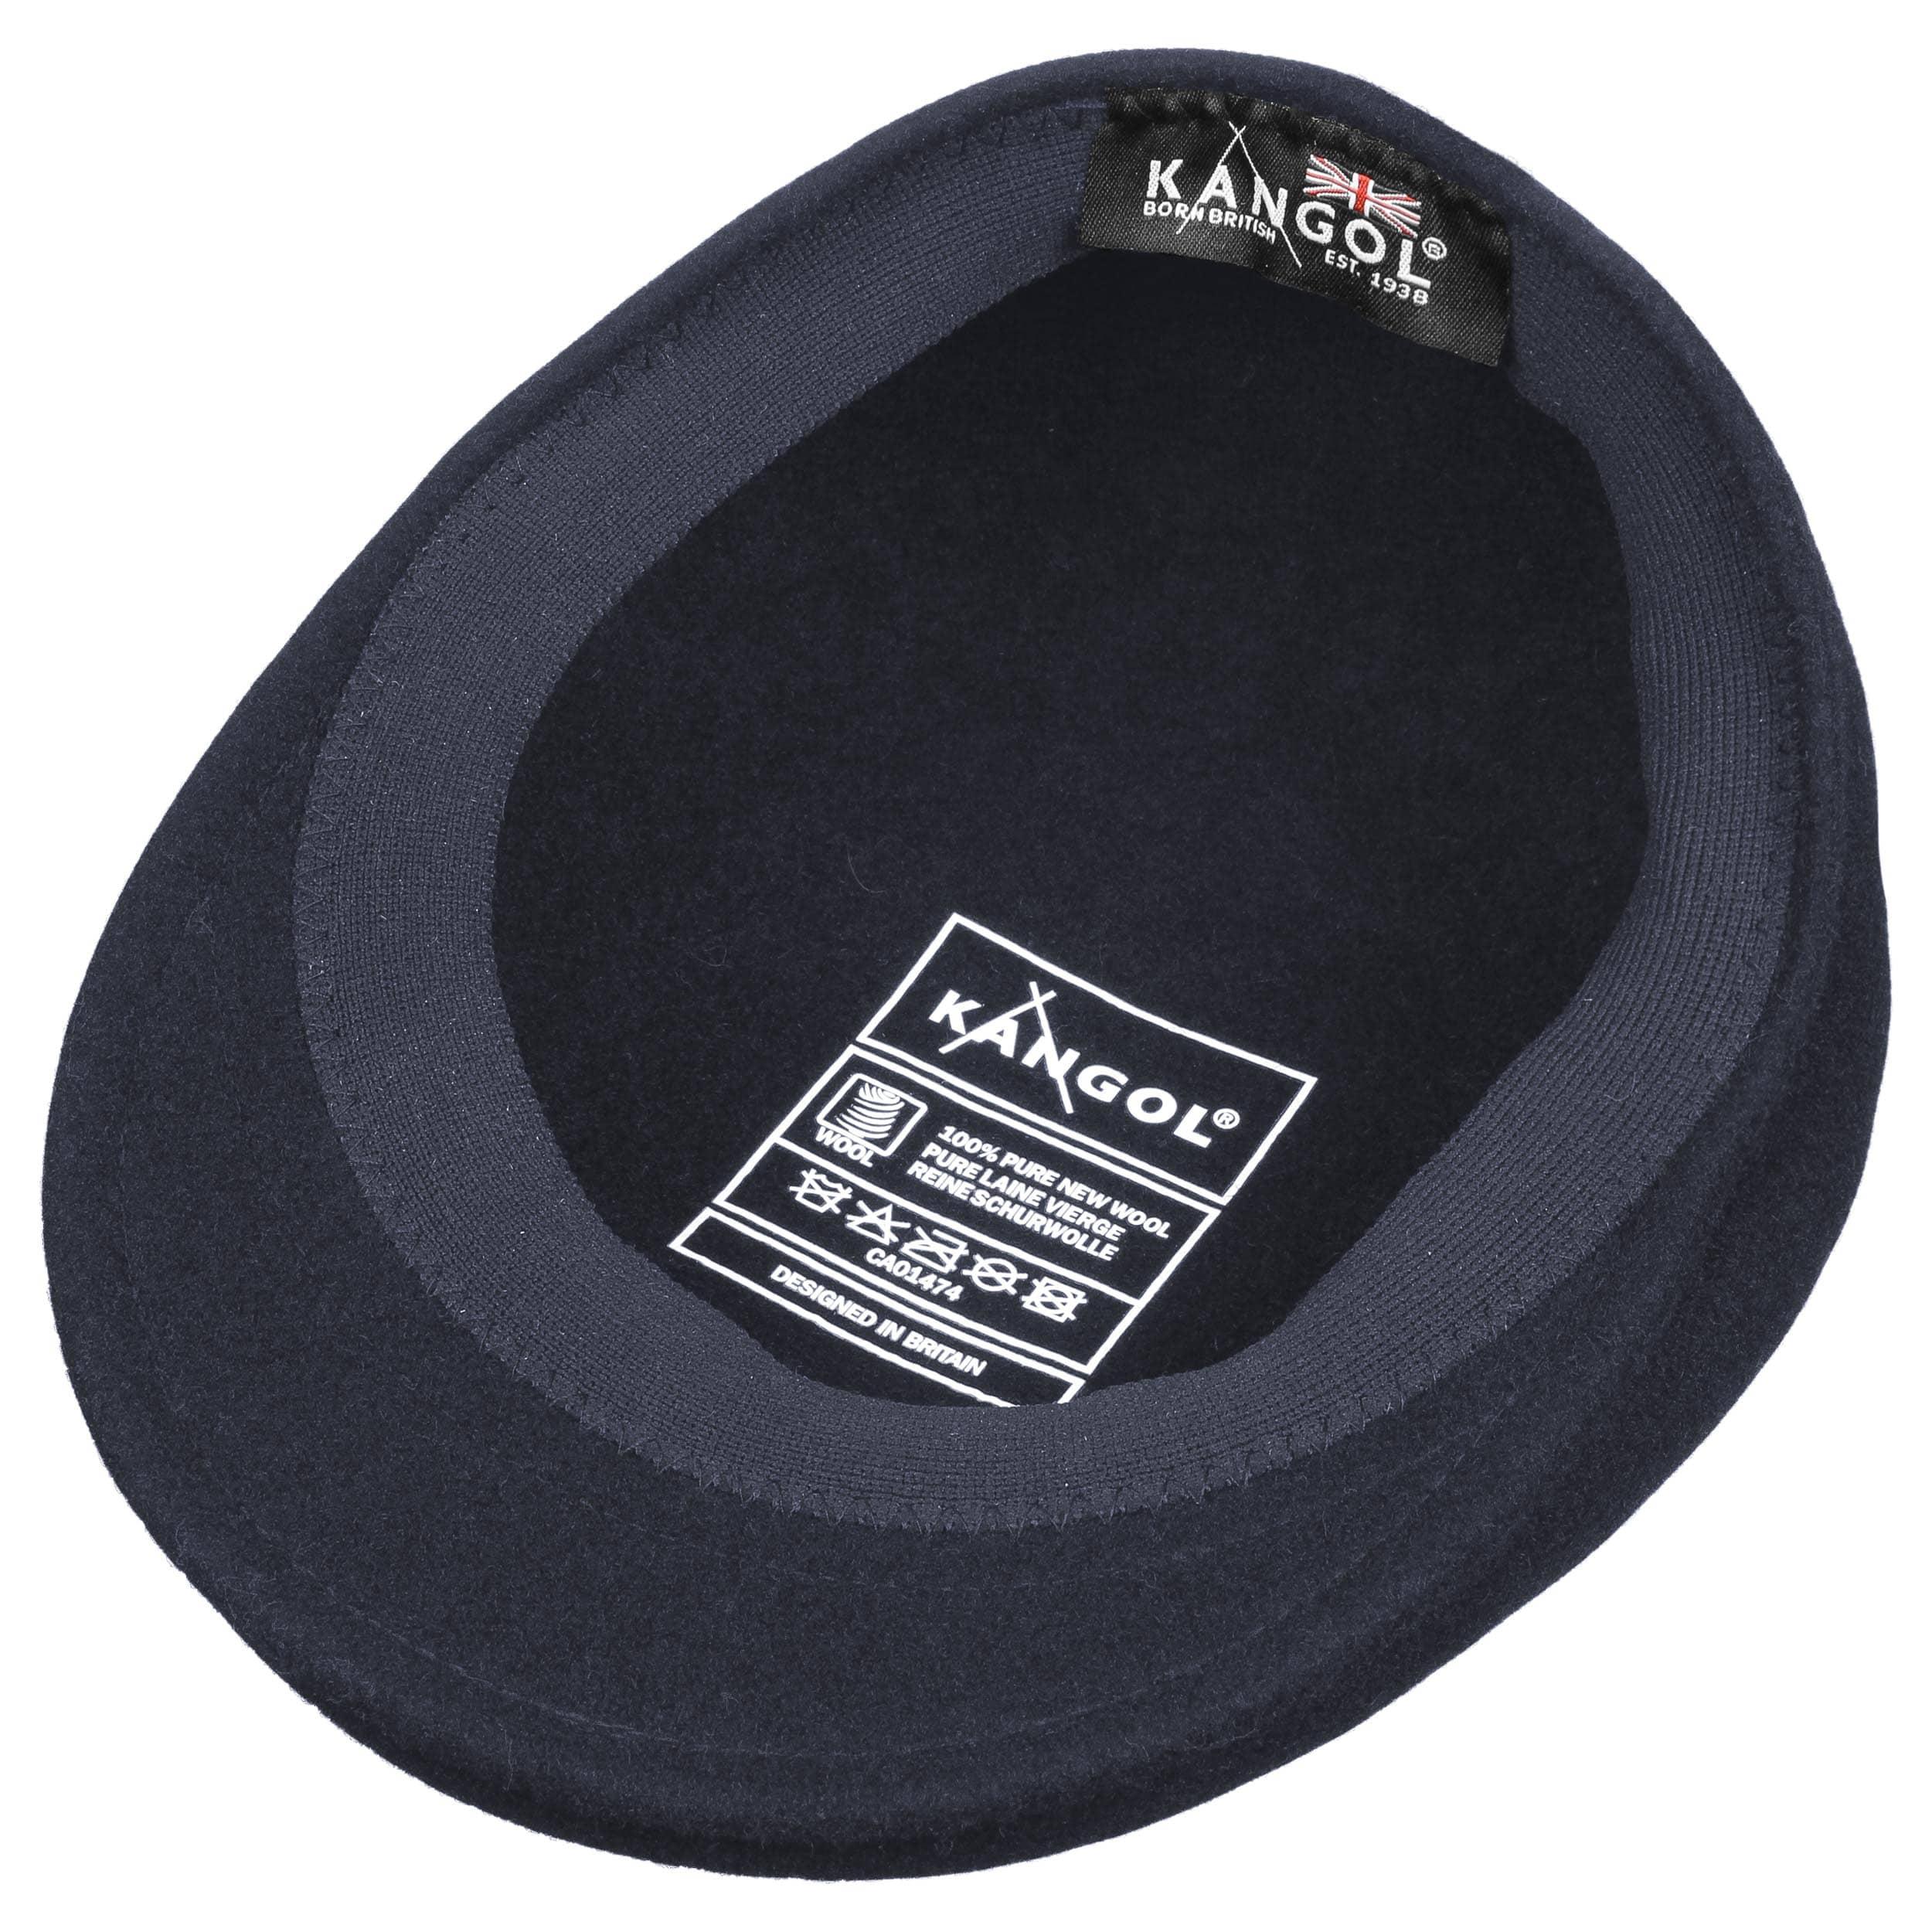 d6c6de3a5d446 Gorra 504 by Kangol - Gorras - sombreroshop.es